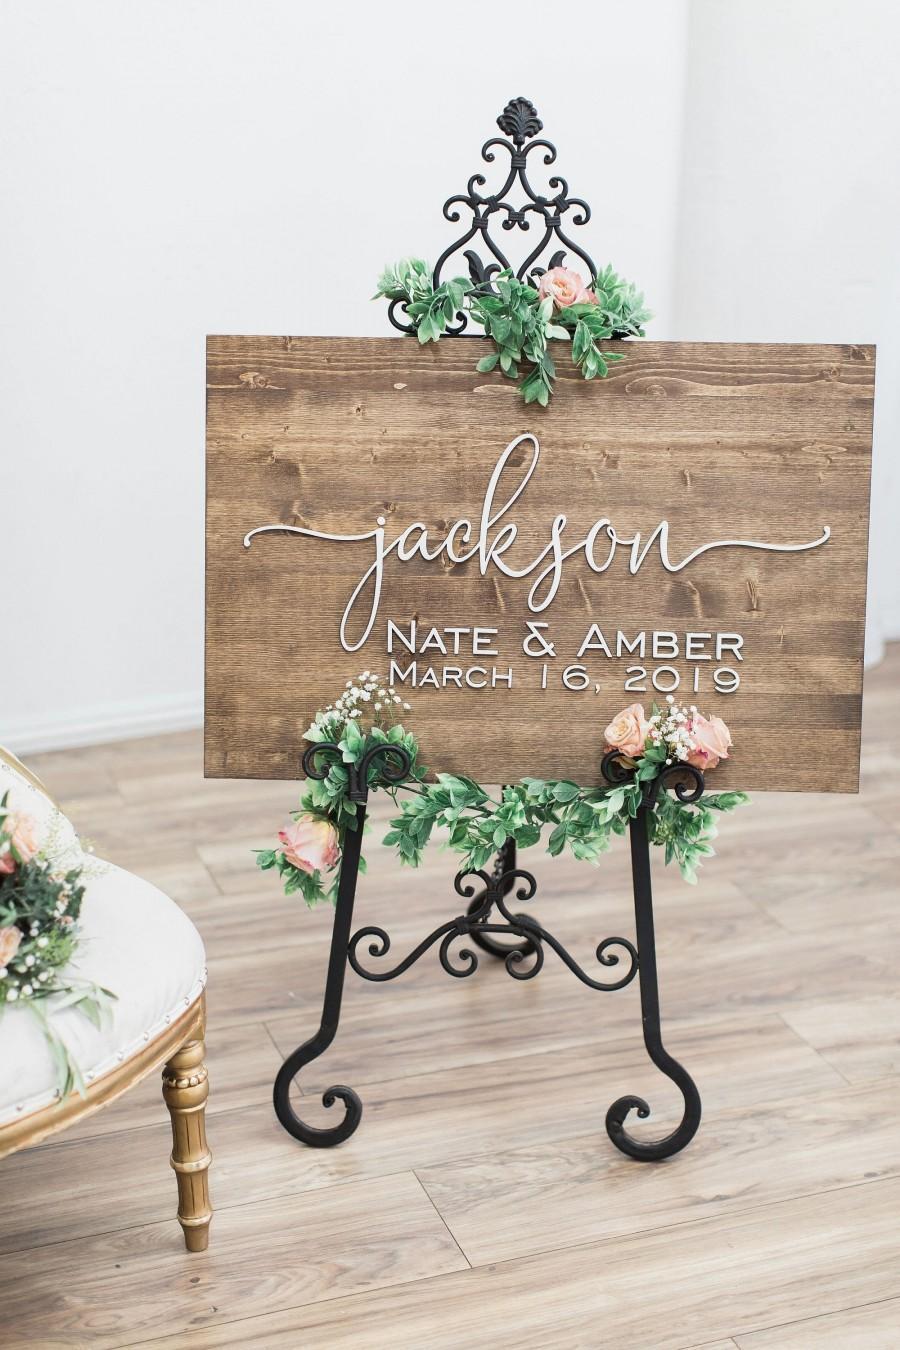 Mariage - Wedding Welcome Sign, Wedding Sign, Rustic Wood Sign, Wedding Signage, Wedding Name Sign, Welcome Sign Wedding, Custom Wedding Sign